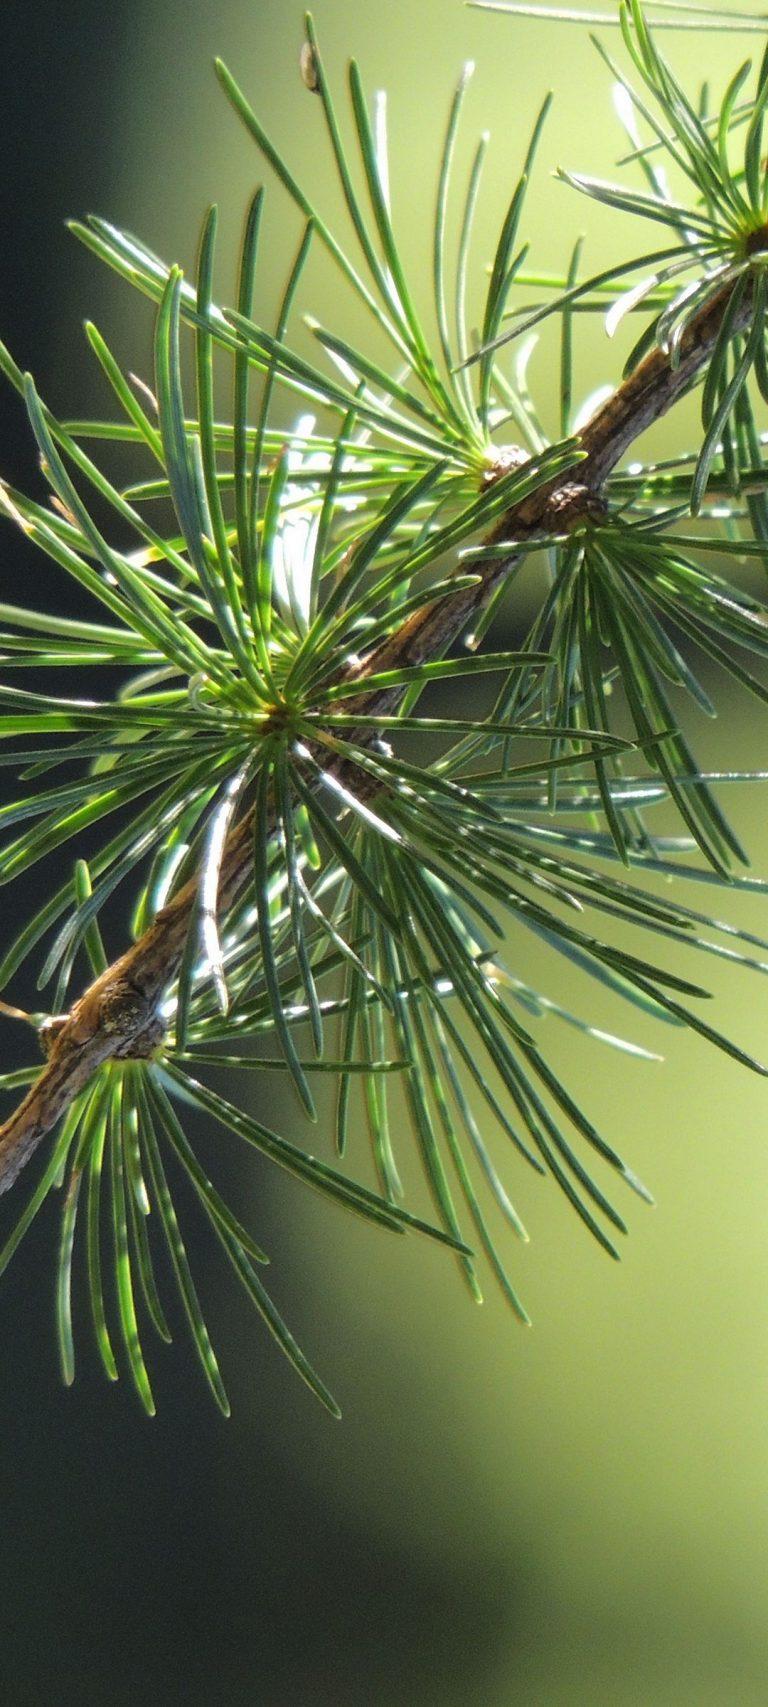 Spruce Branch Thorn Macro 1080x2400 768x1707